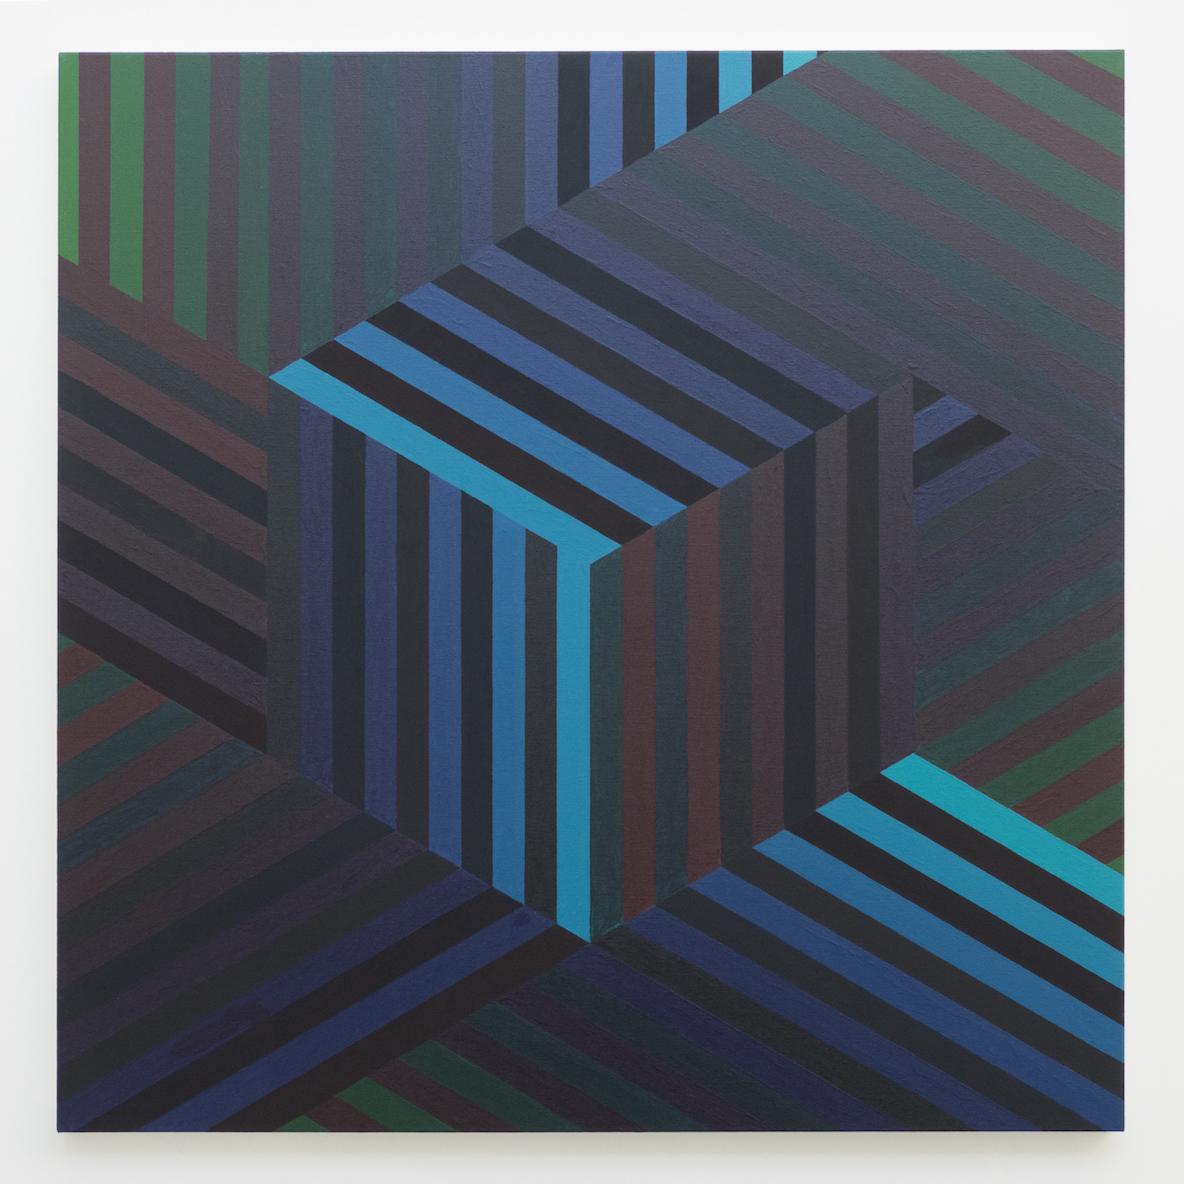 Tom Loveday Edge of Reality 2, 2018, Acrylic On Canvas 107 x 107 cm